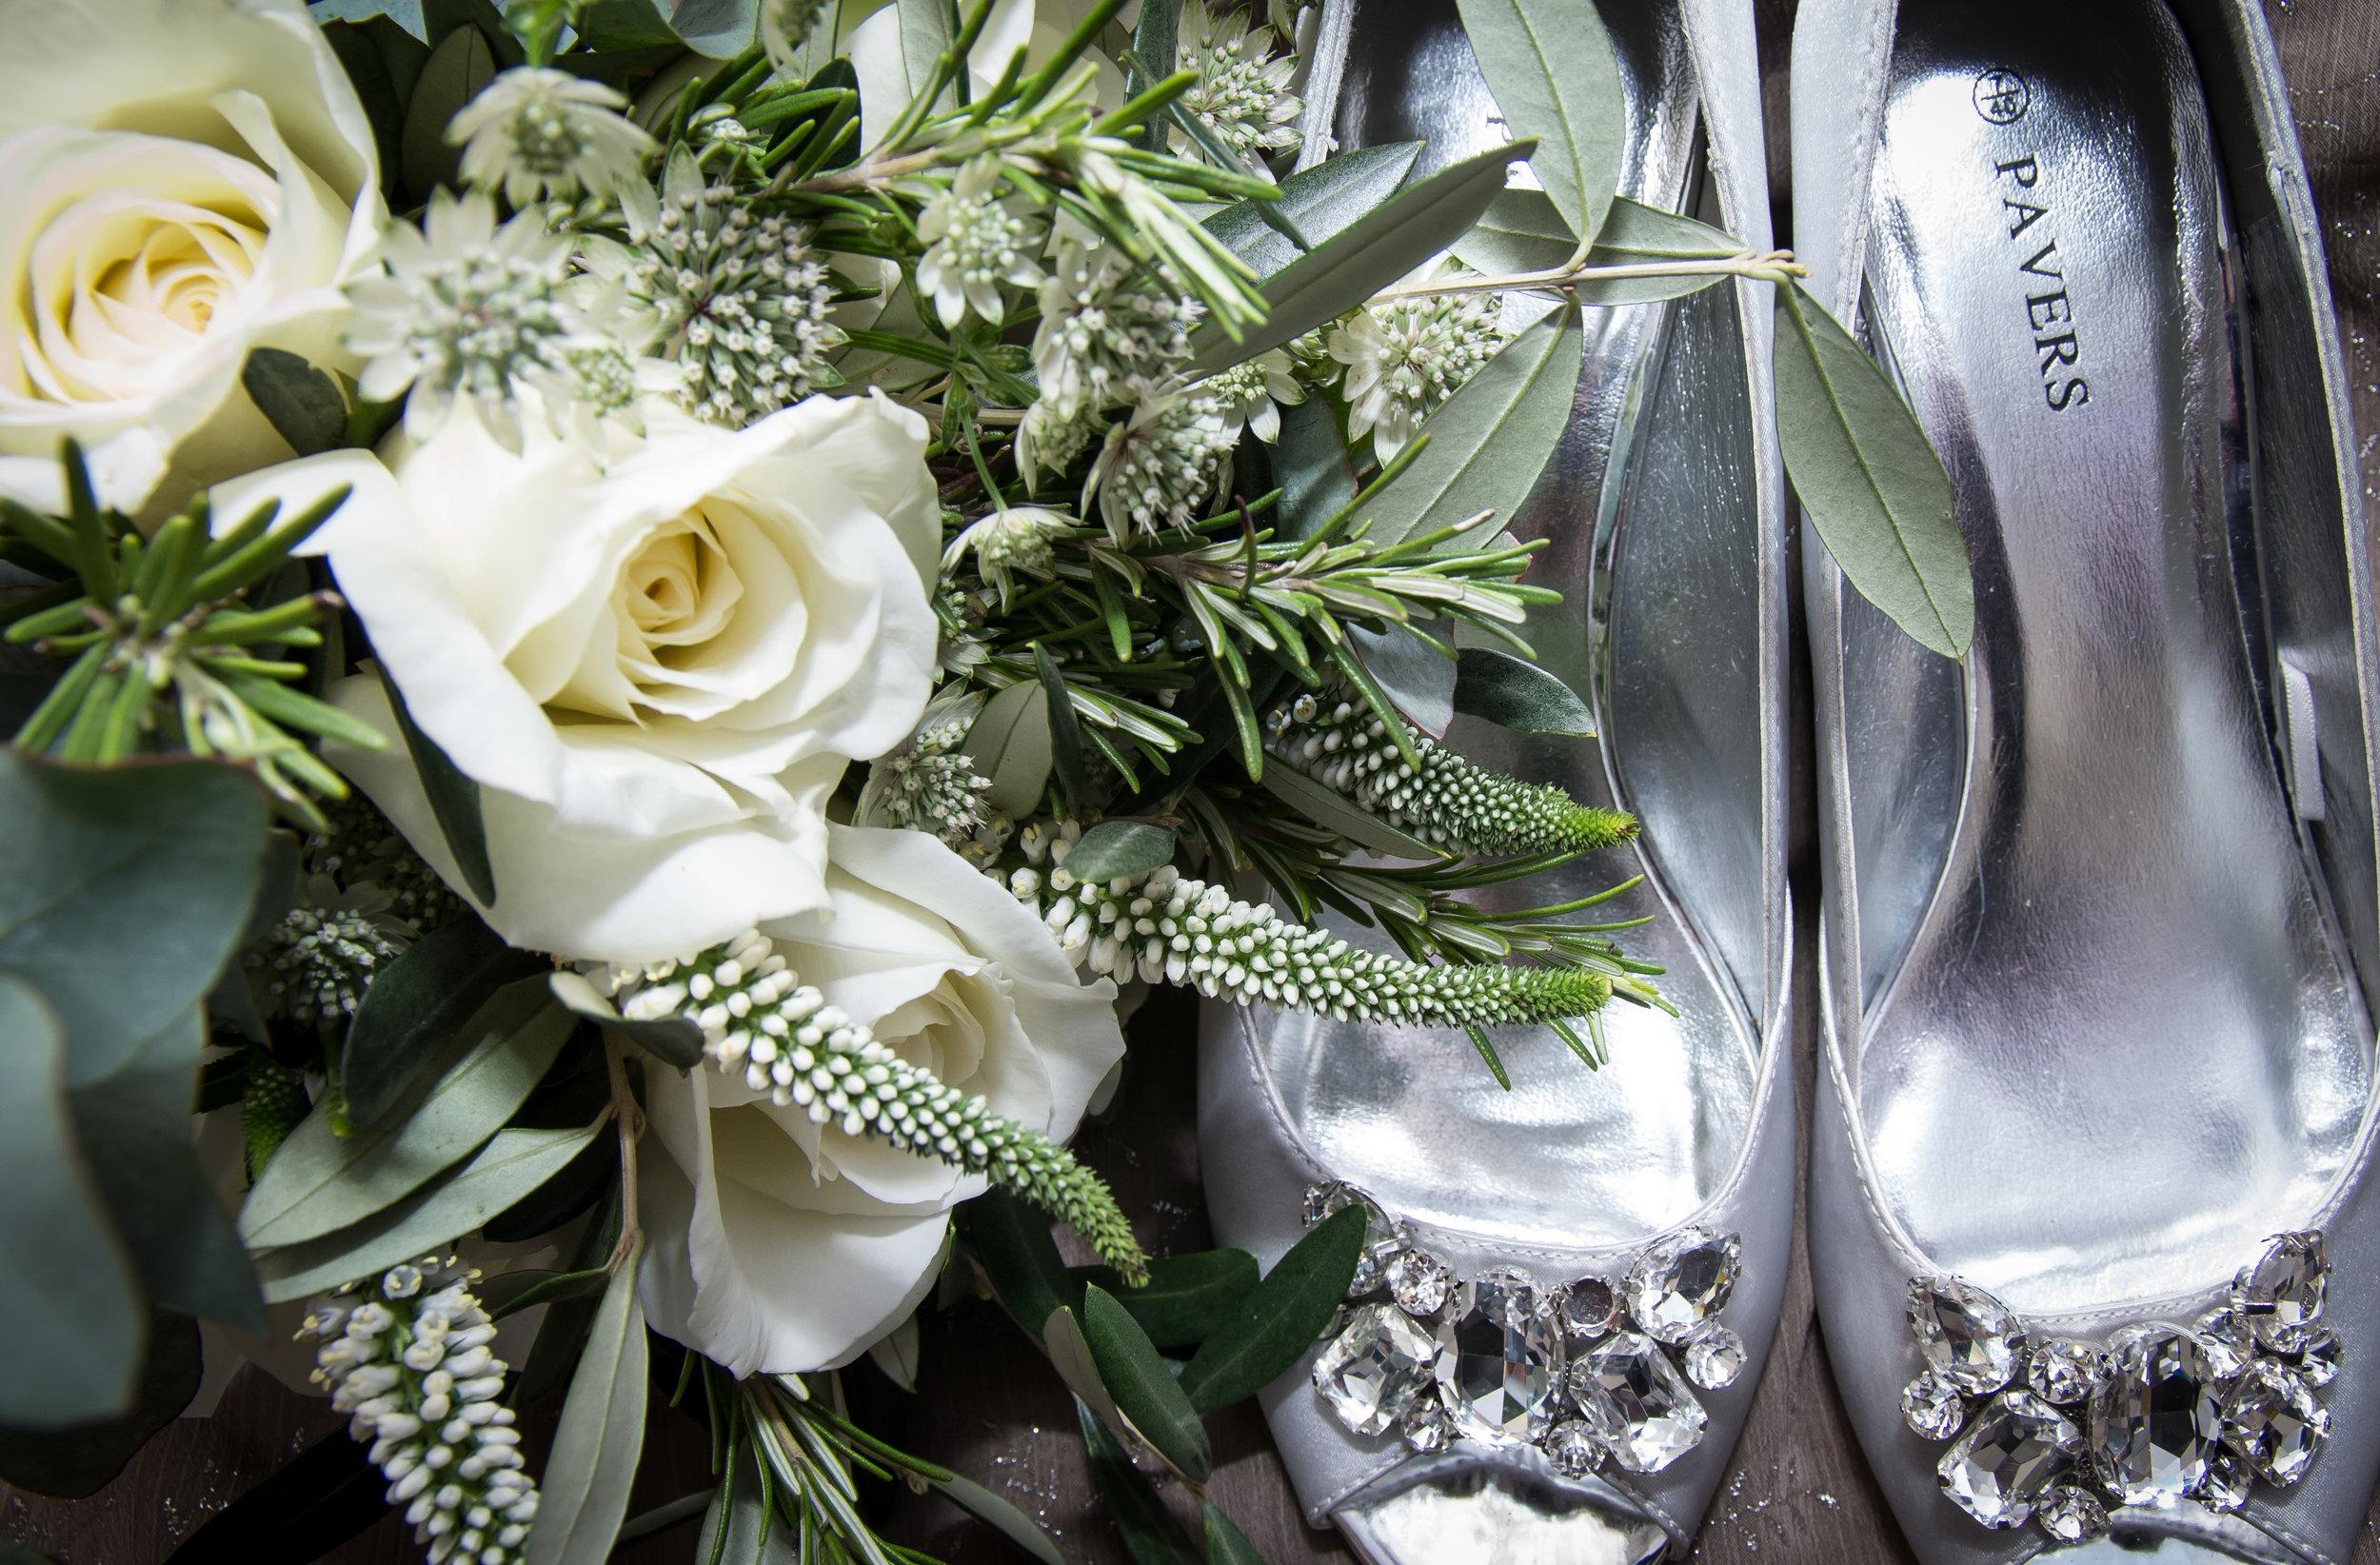 Sian+and+Vittorio+Bridal+bouquet.jpg